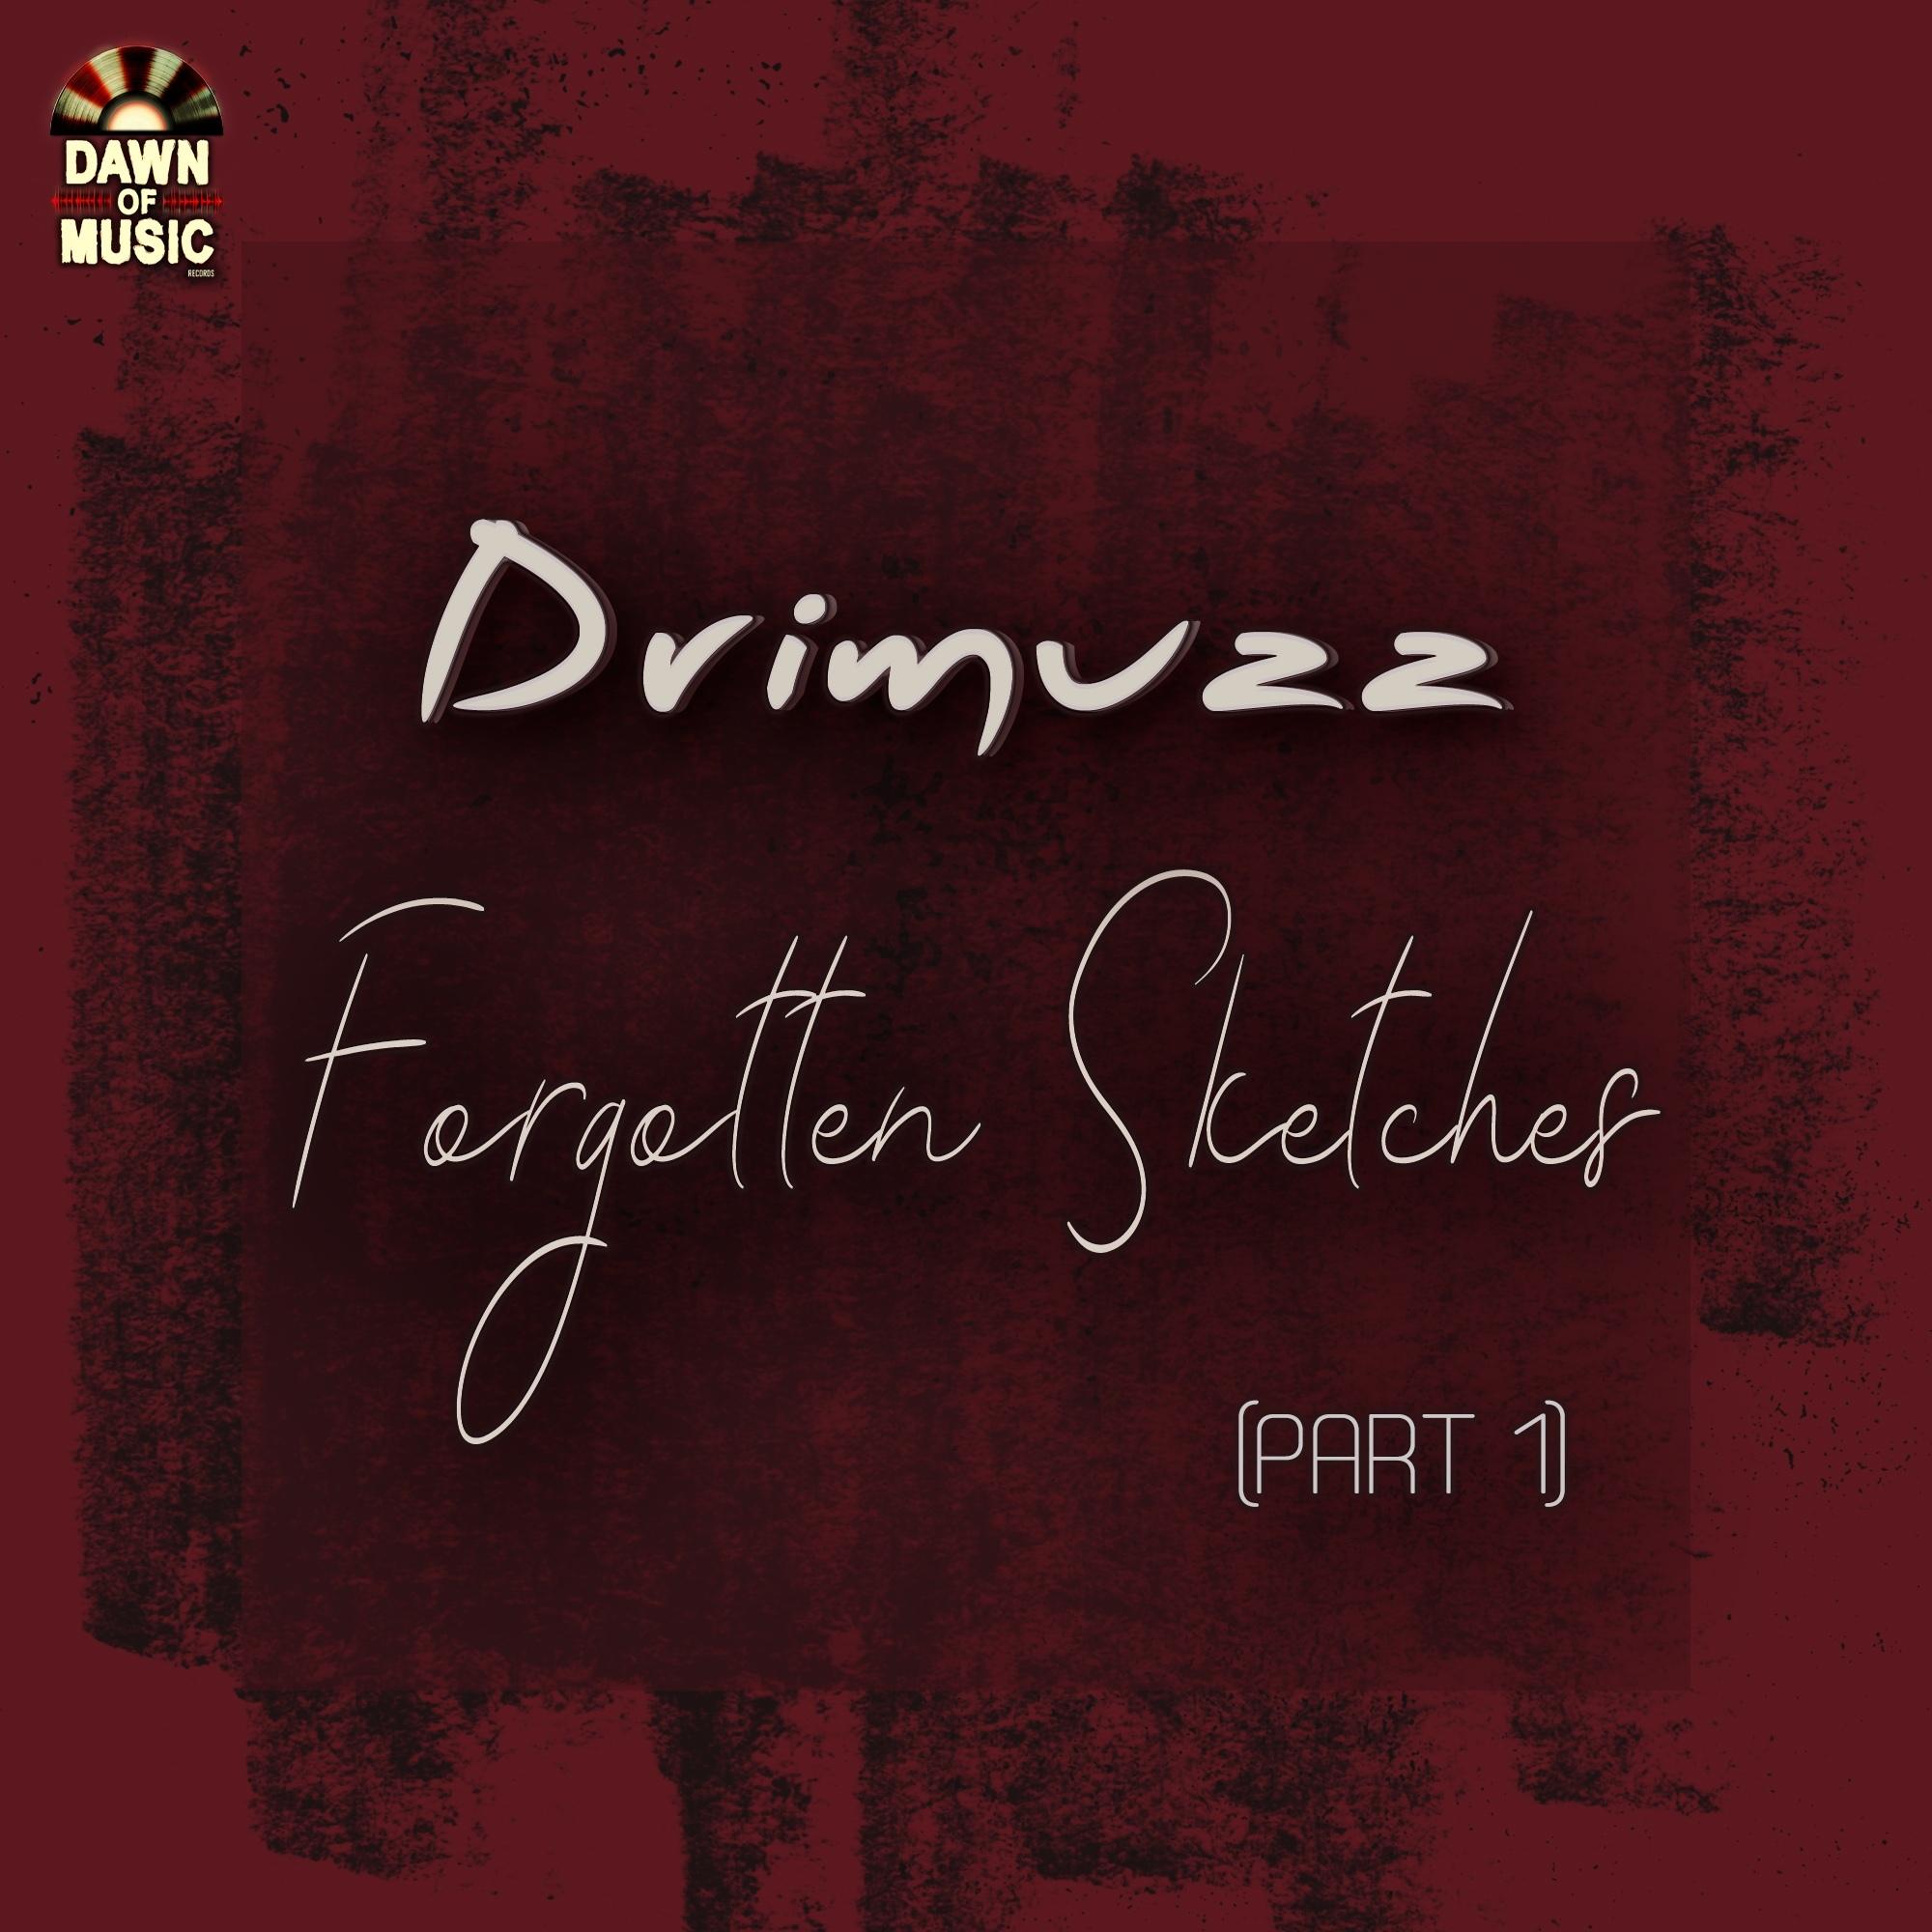 Drimuzz - Forgotten Sketches (Pt. 1)